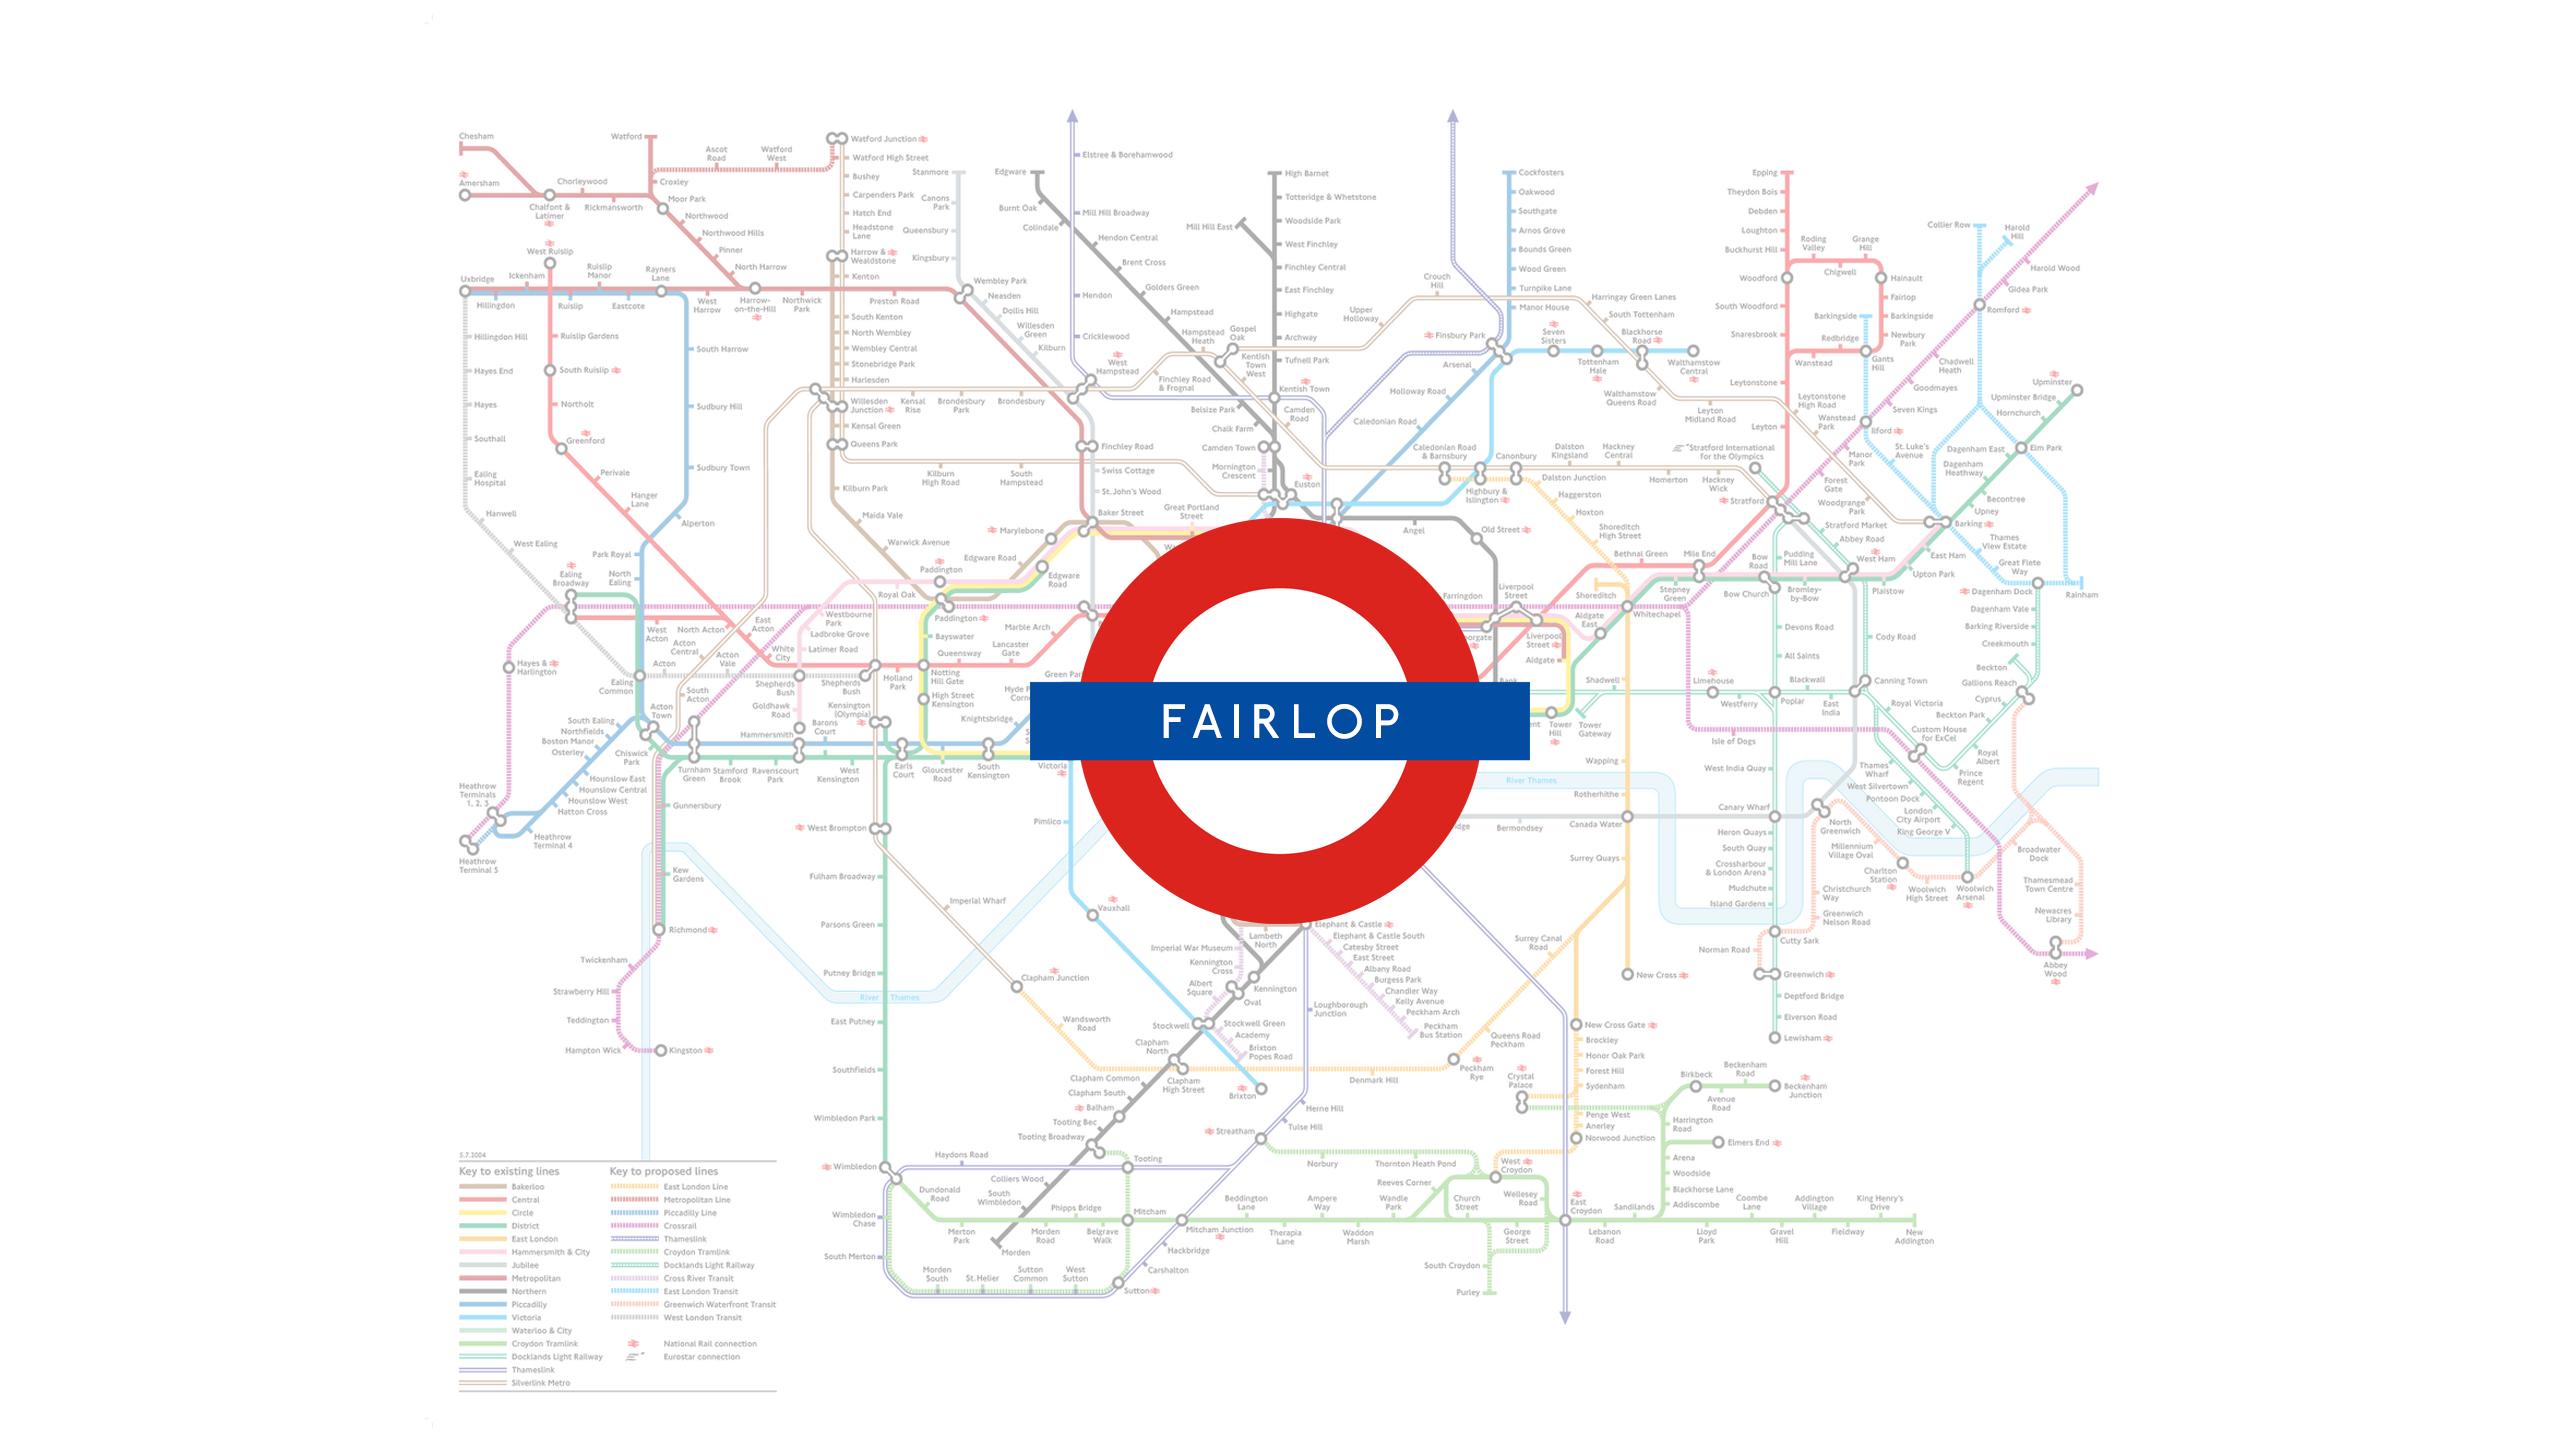 Fairlop (Map)